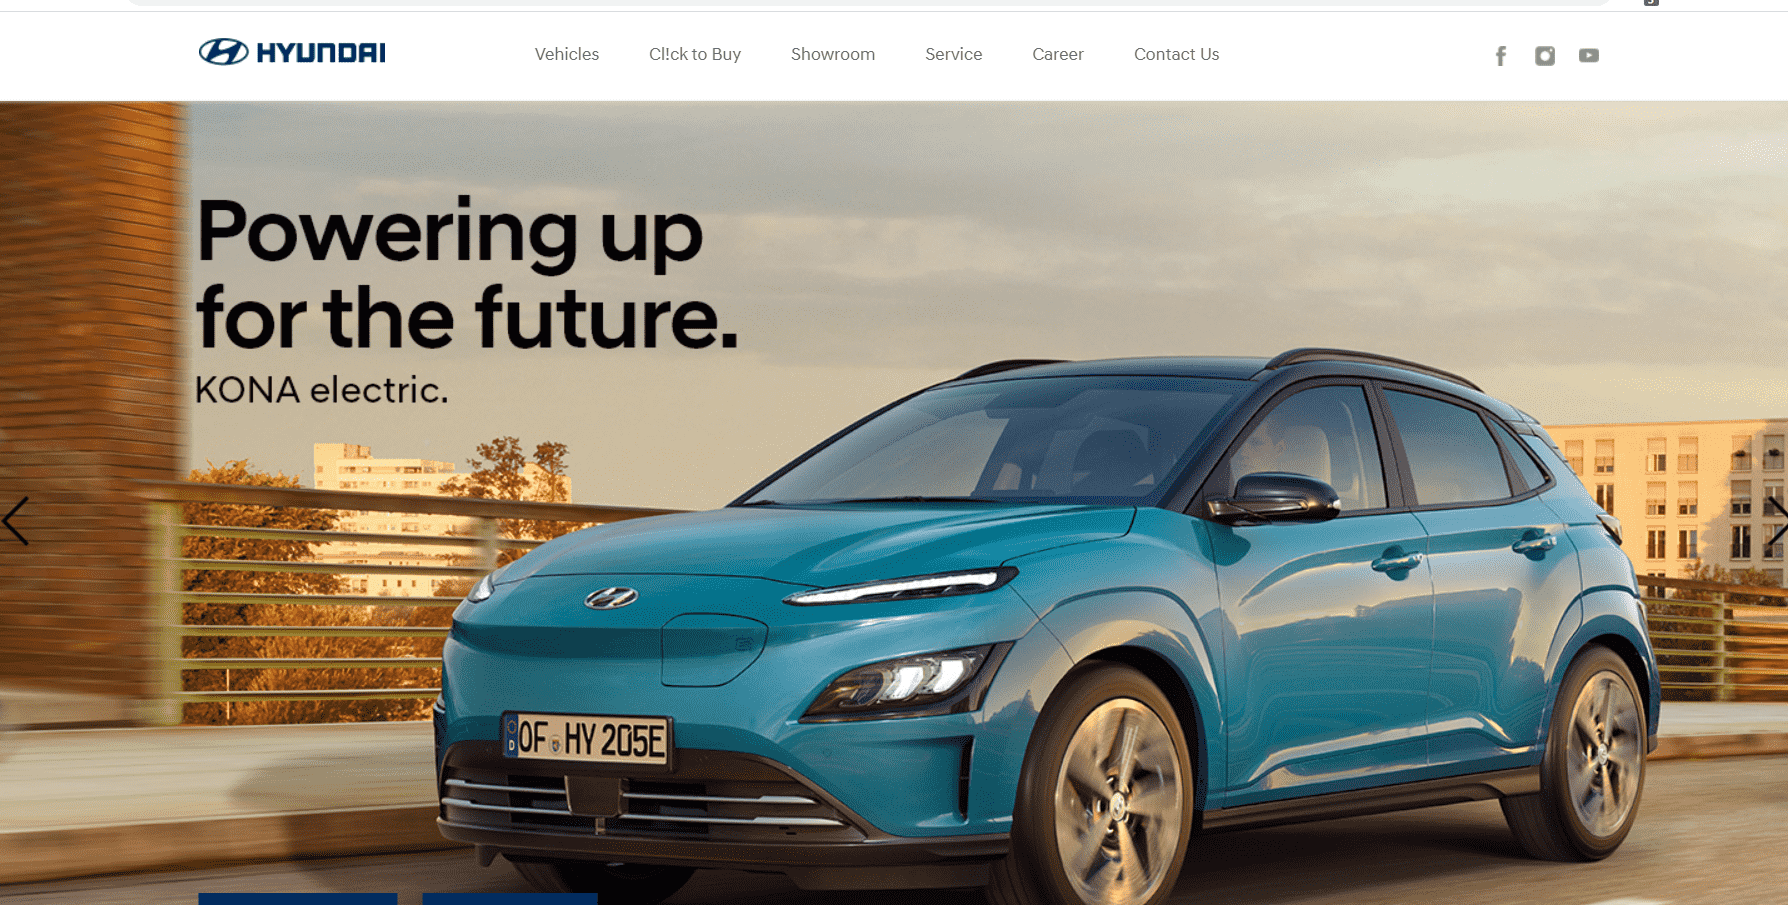 Hyundai Malaysia reviews and complaints